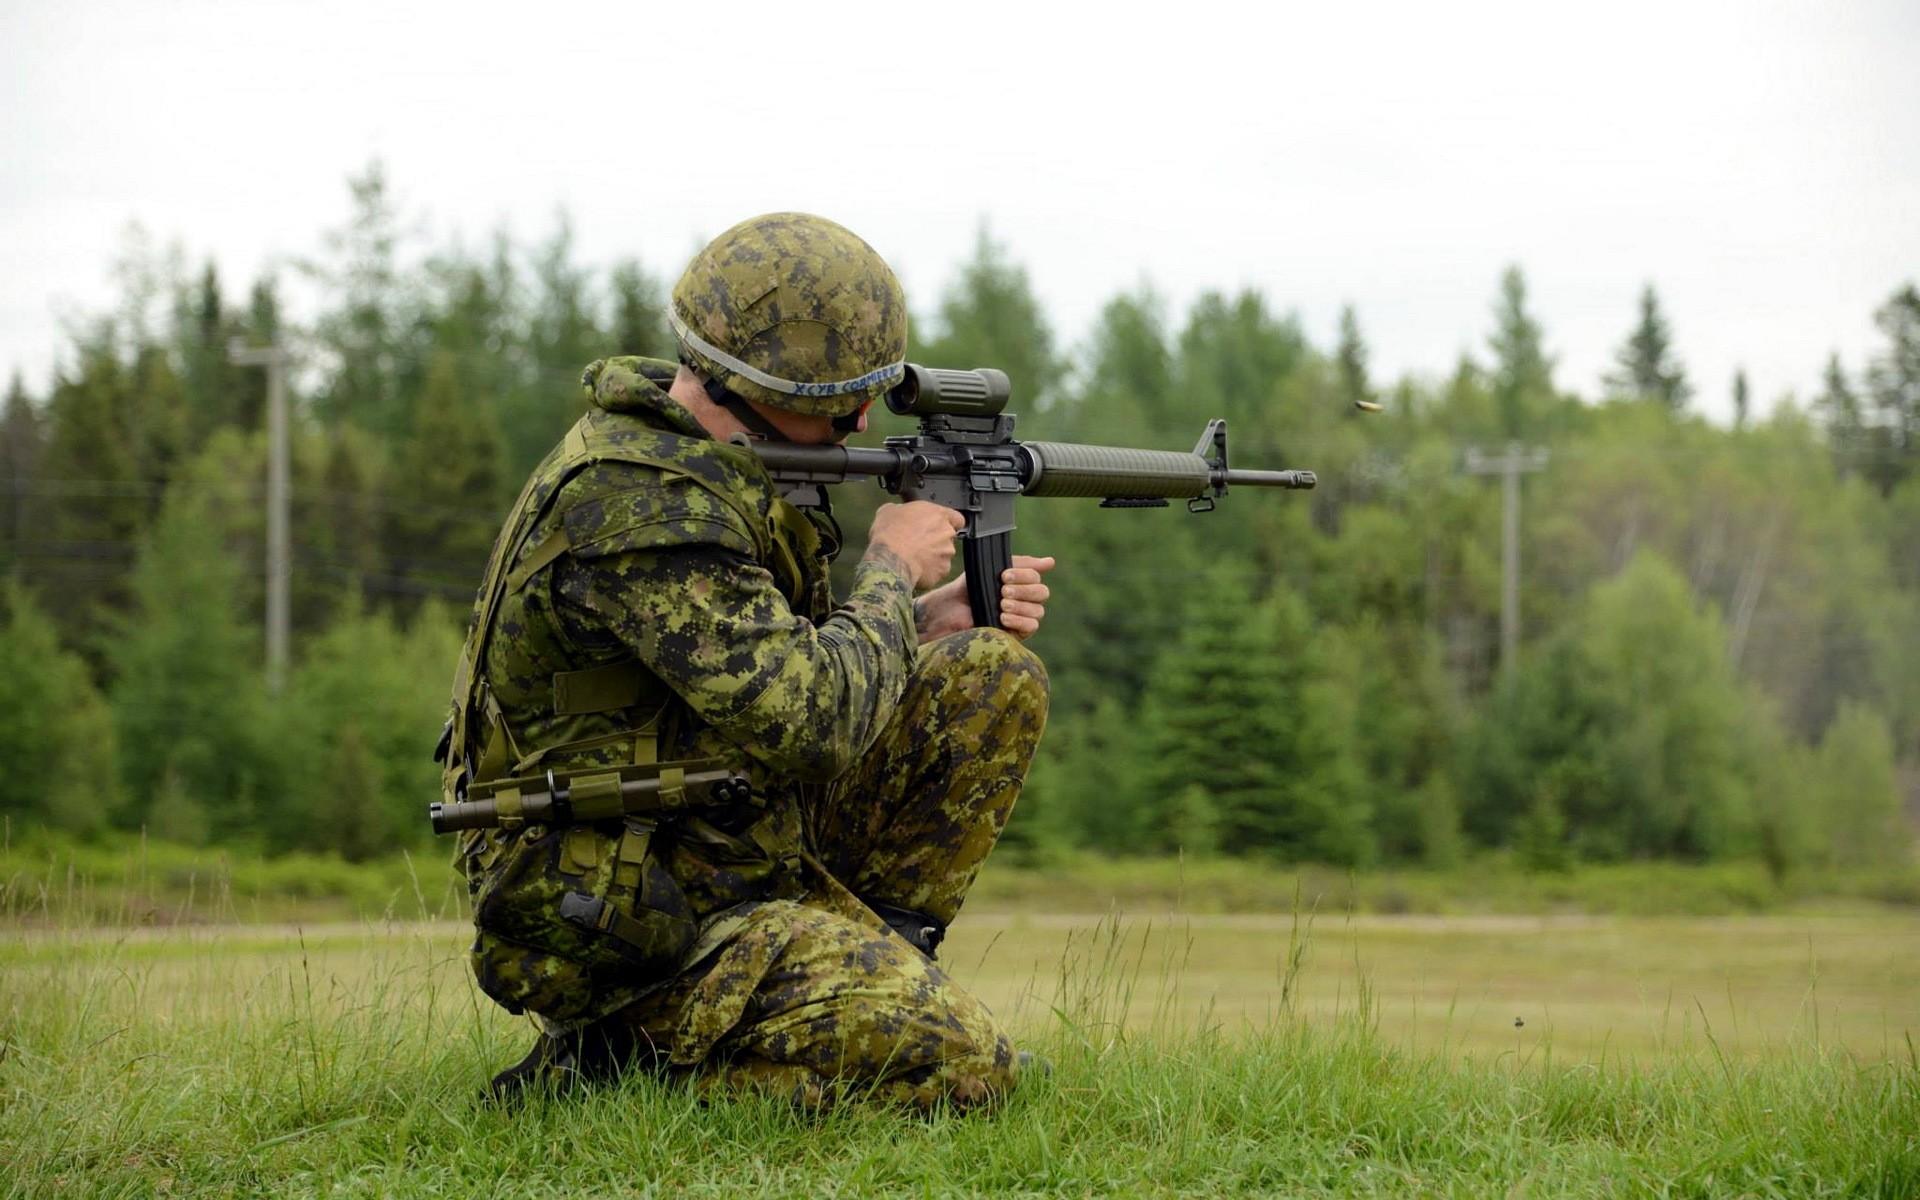 Soldado disparando - 1920x1200